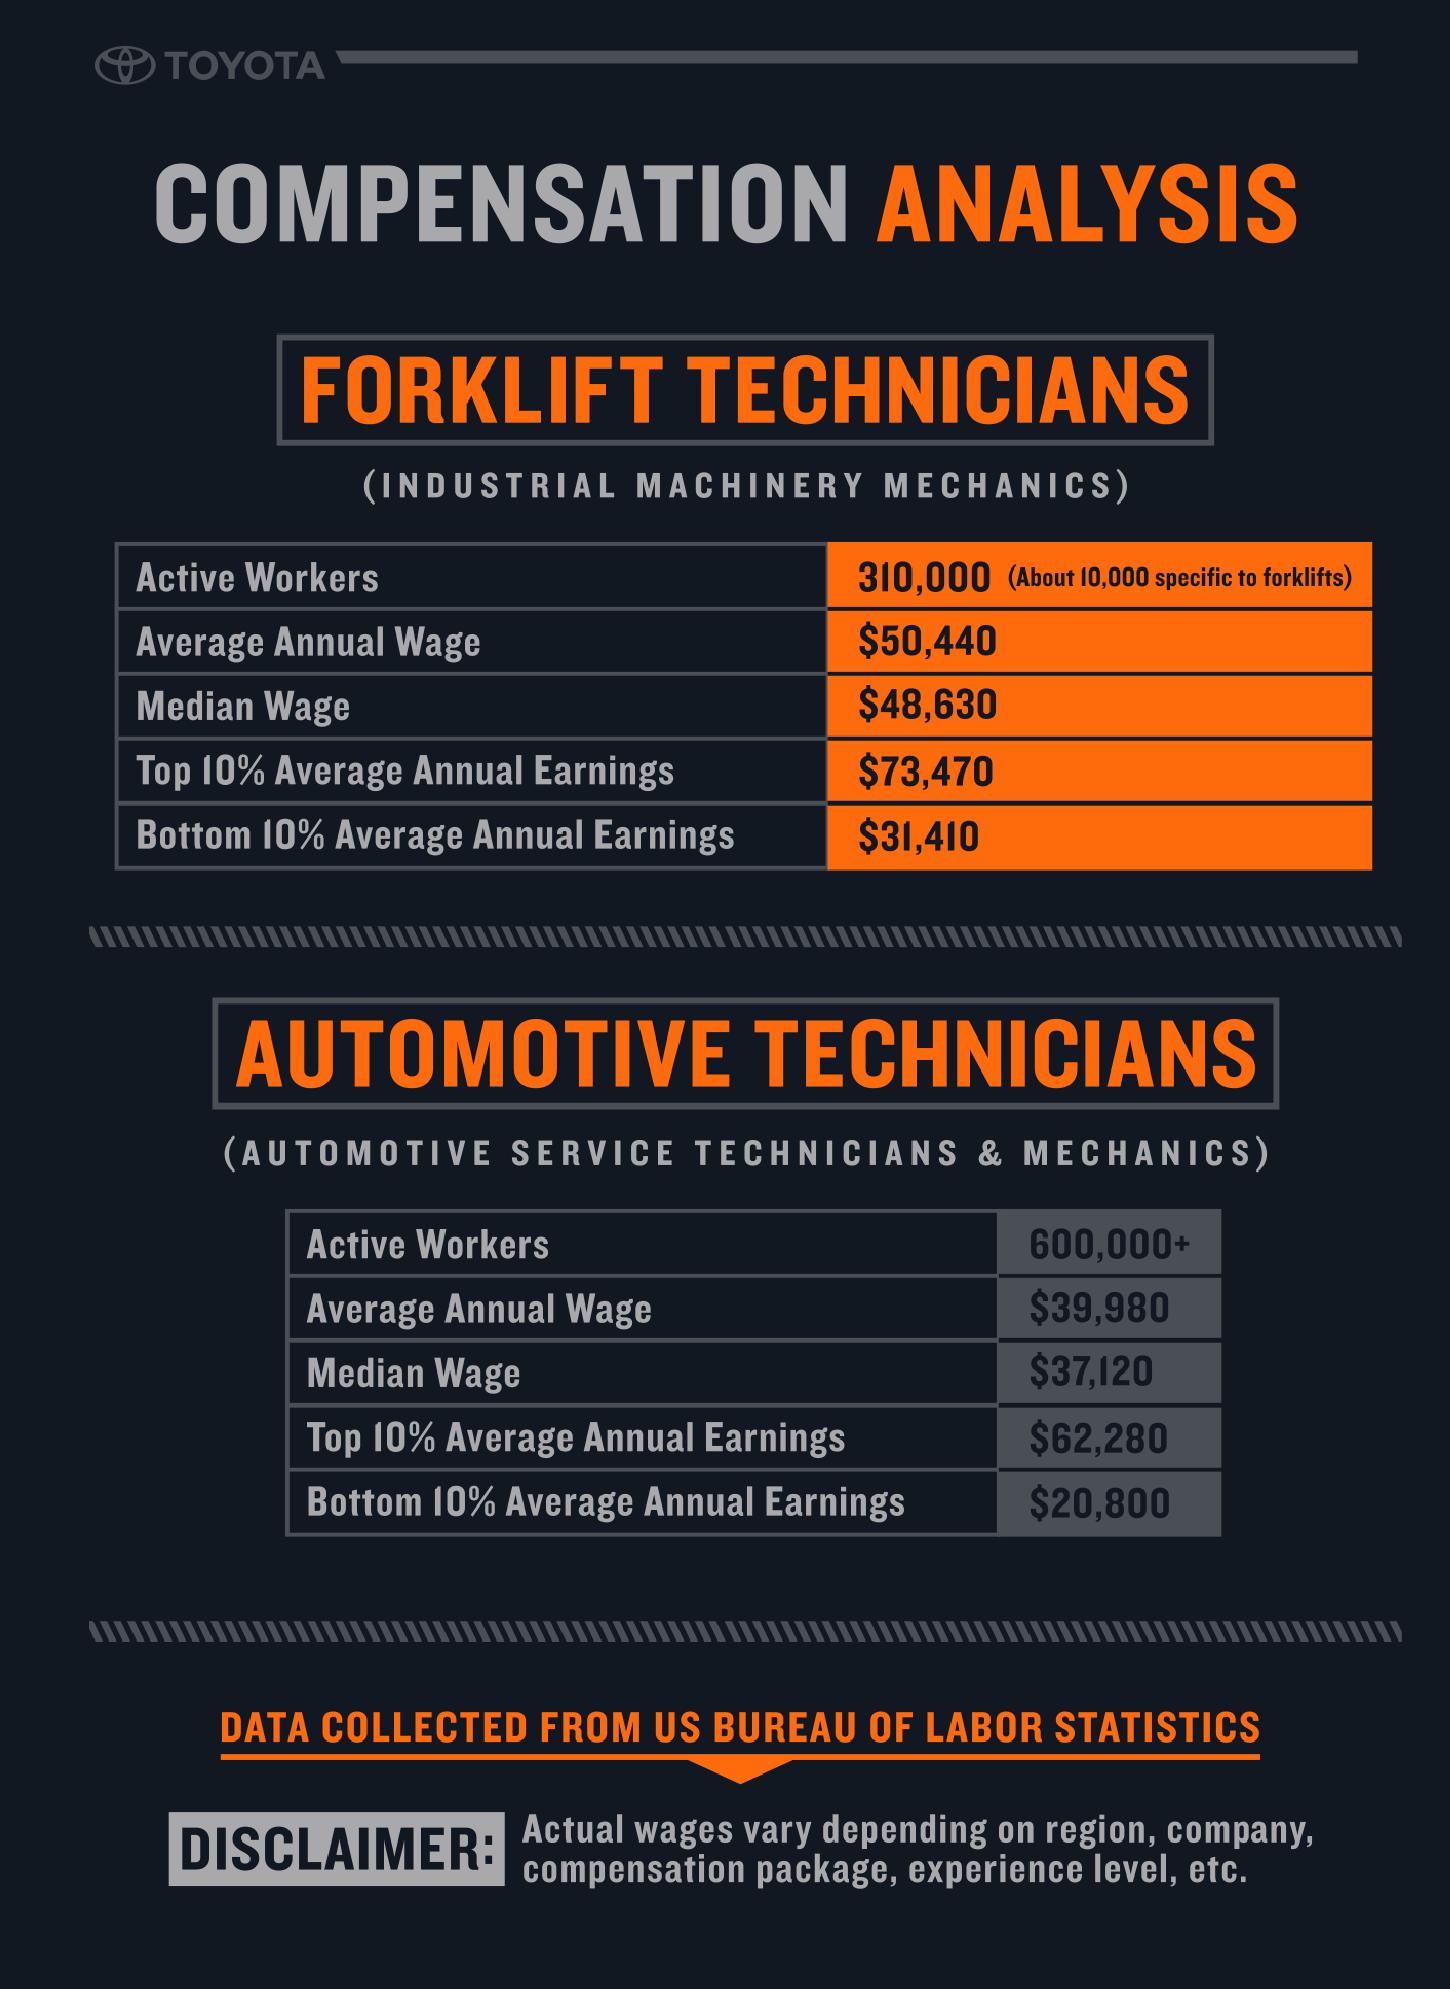 Forklift-Tech-Vs-Auto-Mechanic-Pay